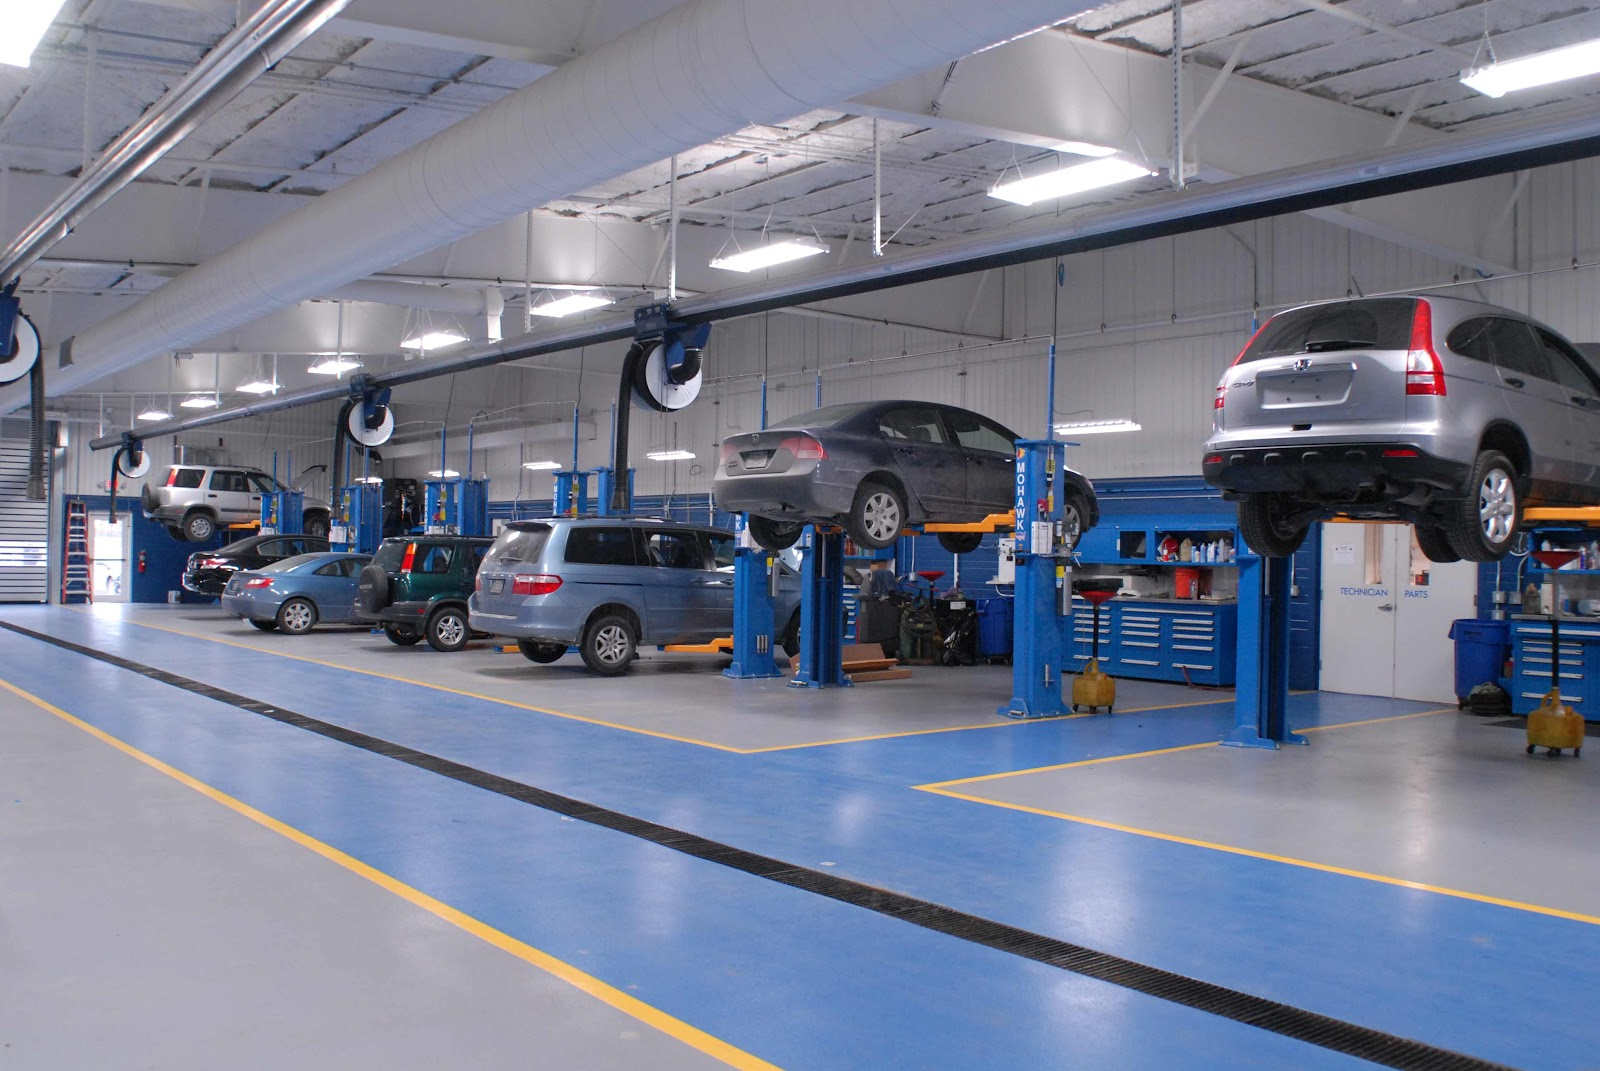 Honda Carland Service >> Memorial Day Savings On Service At Honda Carland In Roswell